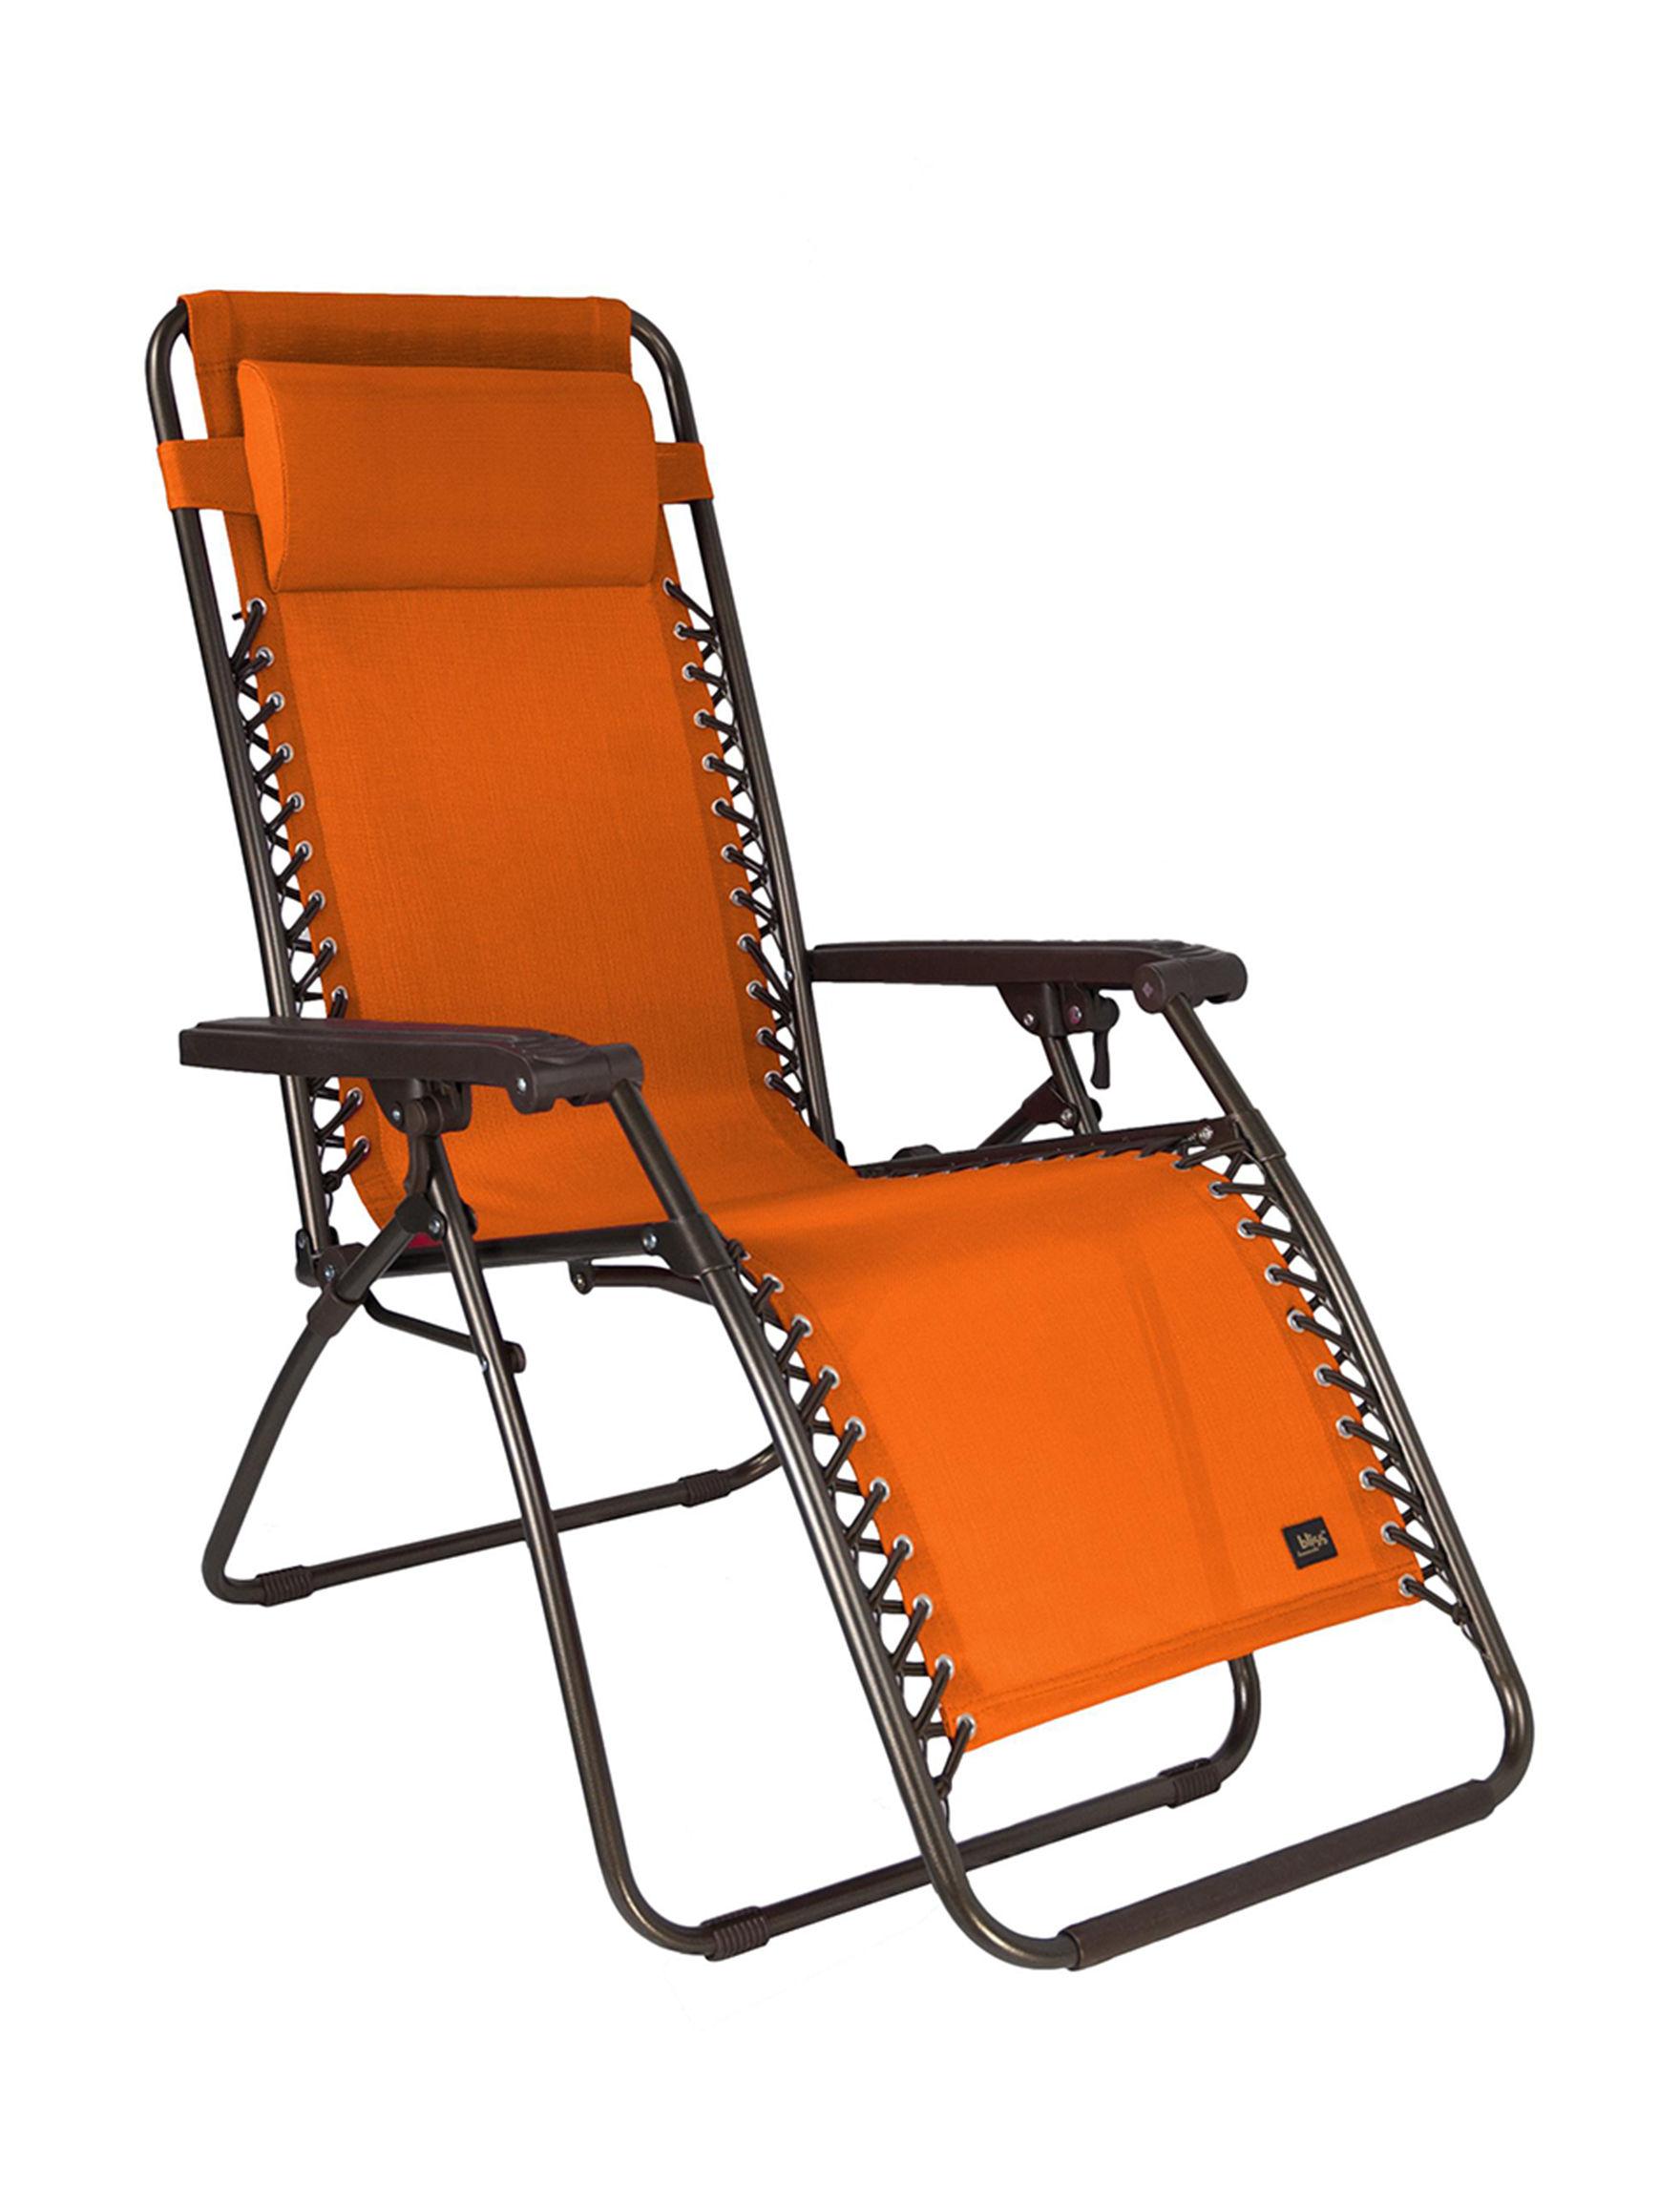 Bliss Orange Patio & Outdoor Furniture